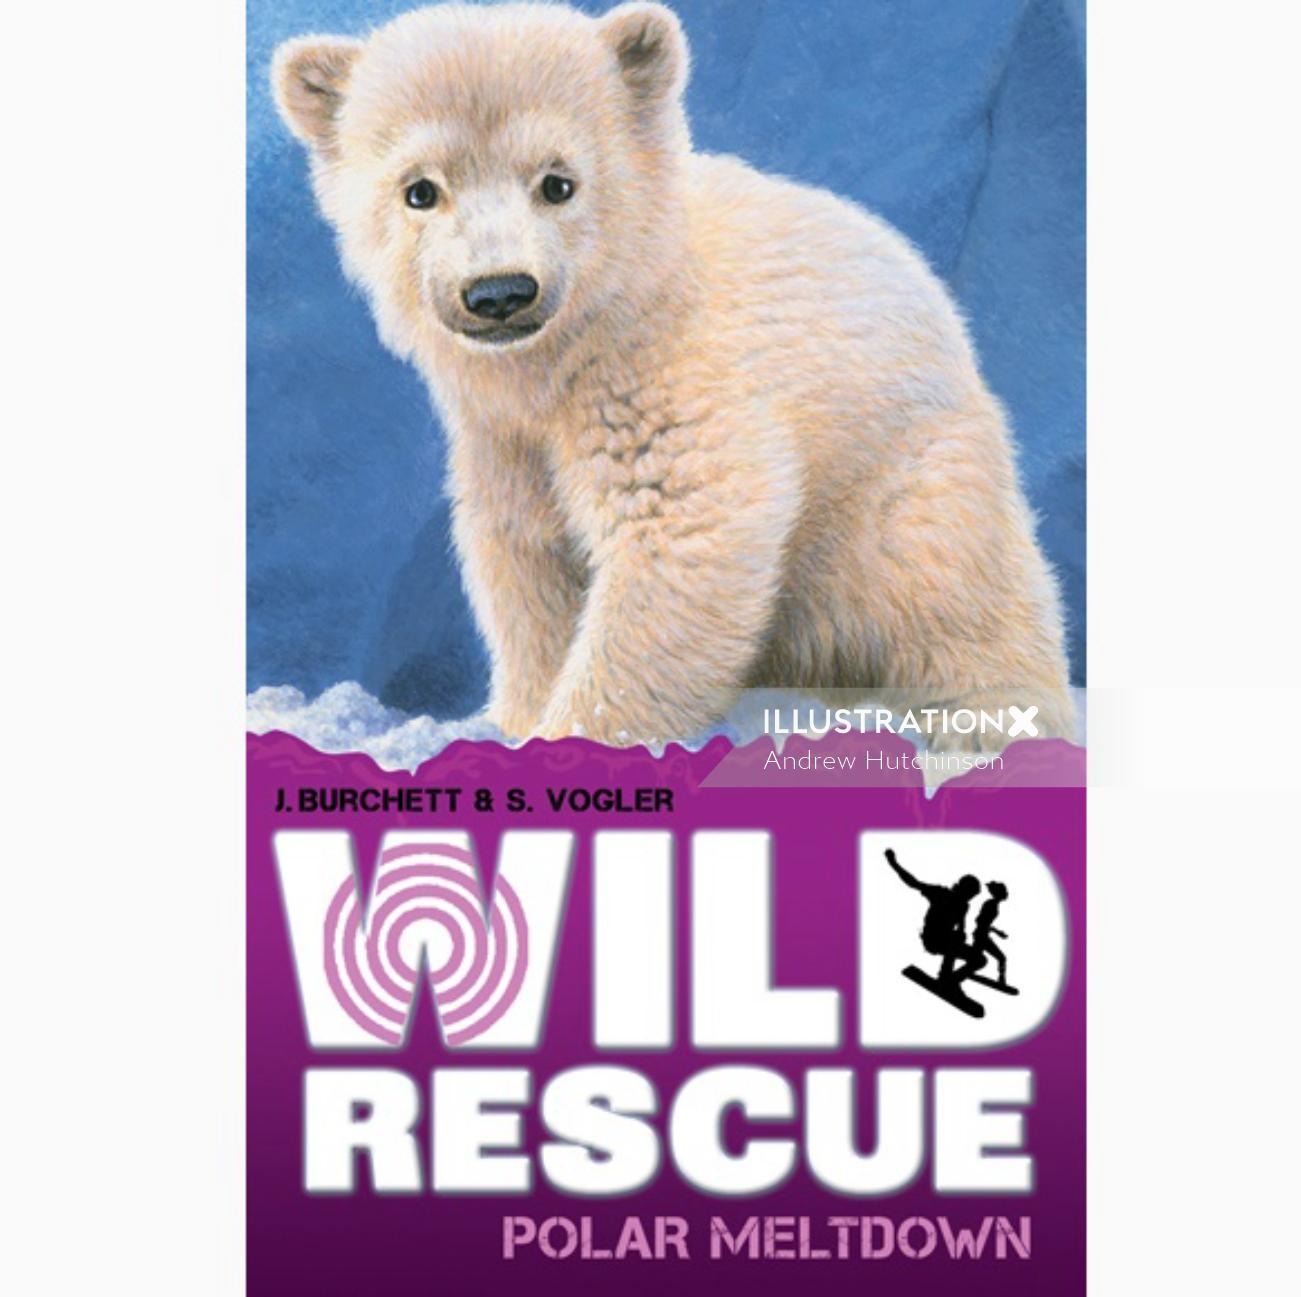 Polar Bear Cub Illustration, Wildlife Images © Andrew Hutchinson